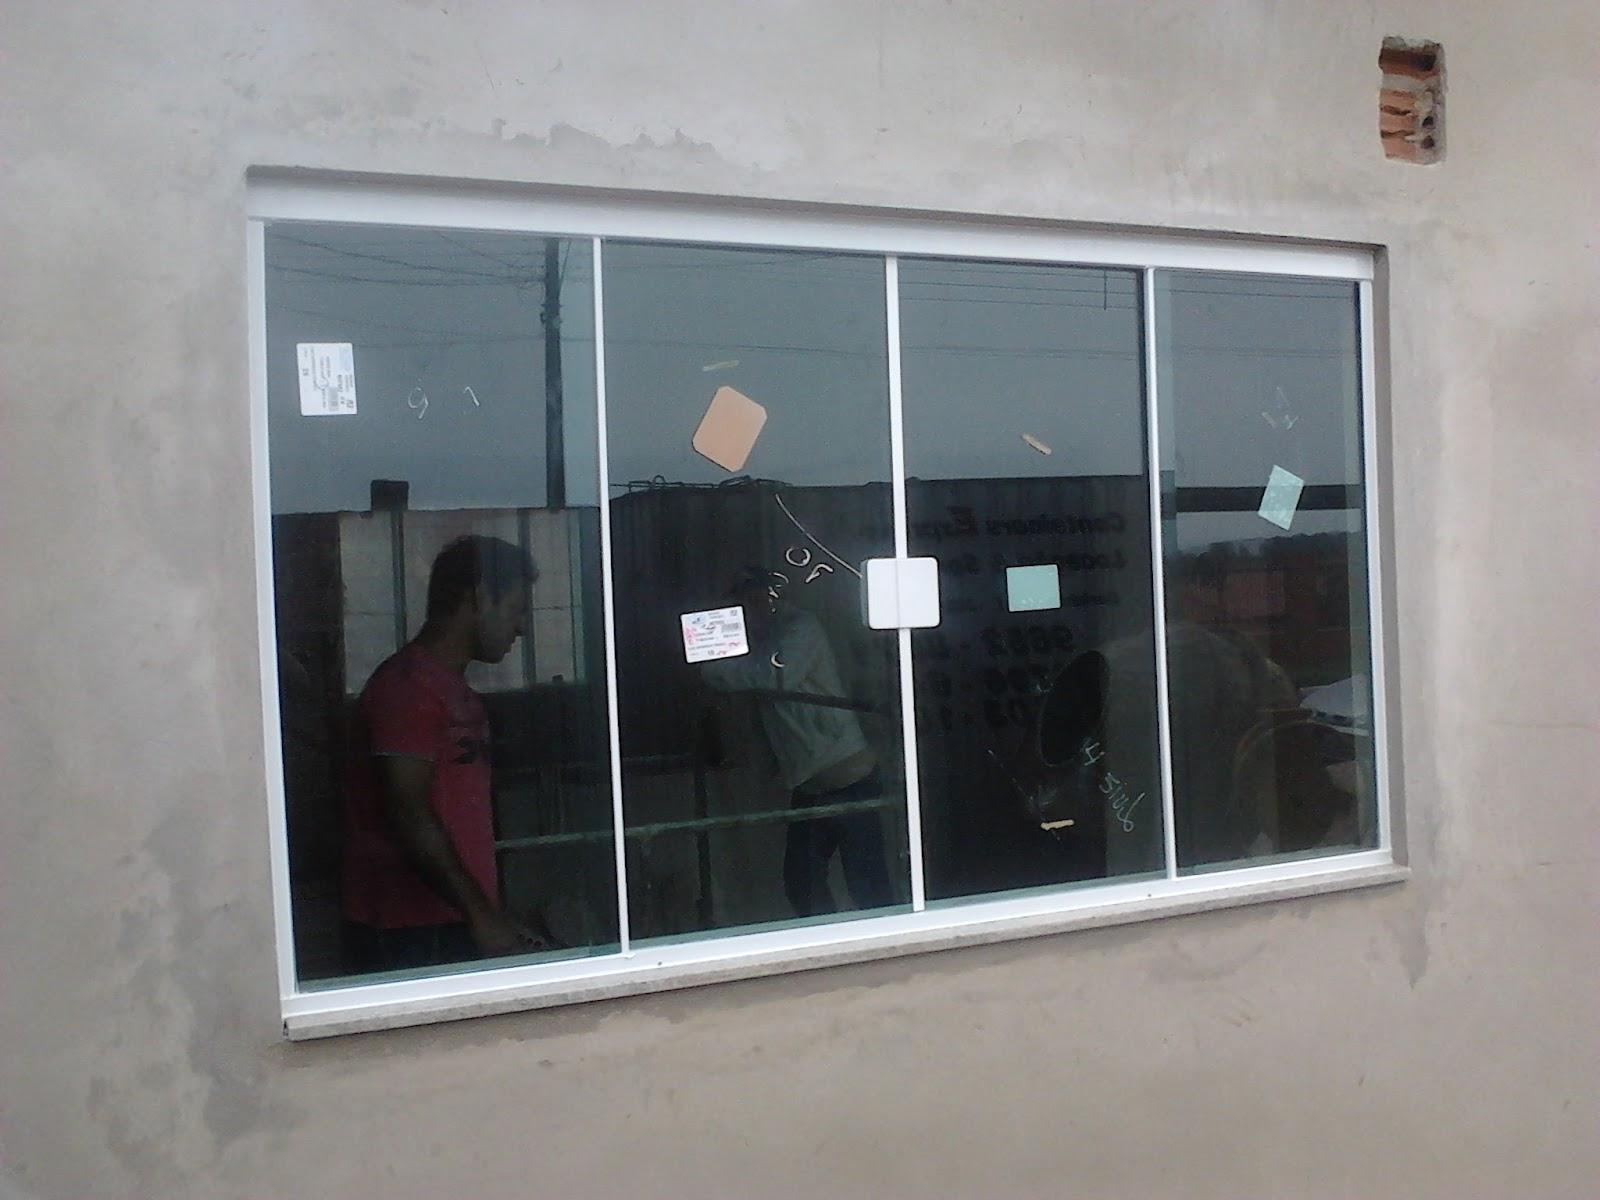 FRANCO VIDROS TEMPERADOS: Junho 2012 #5F4B44 1600 1200